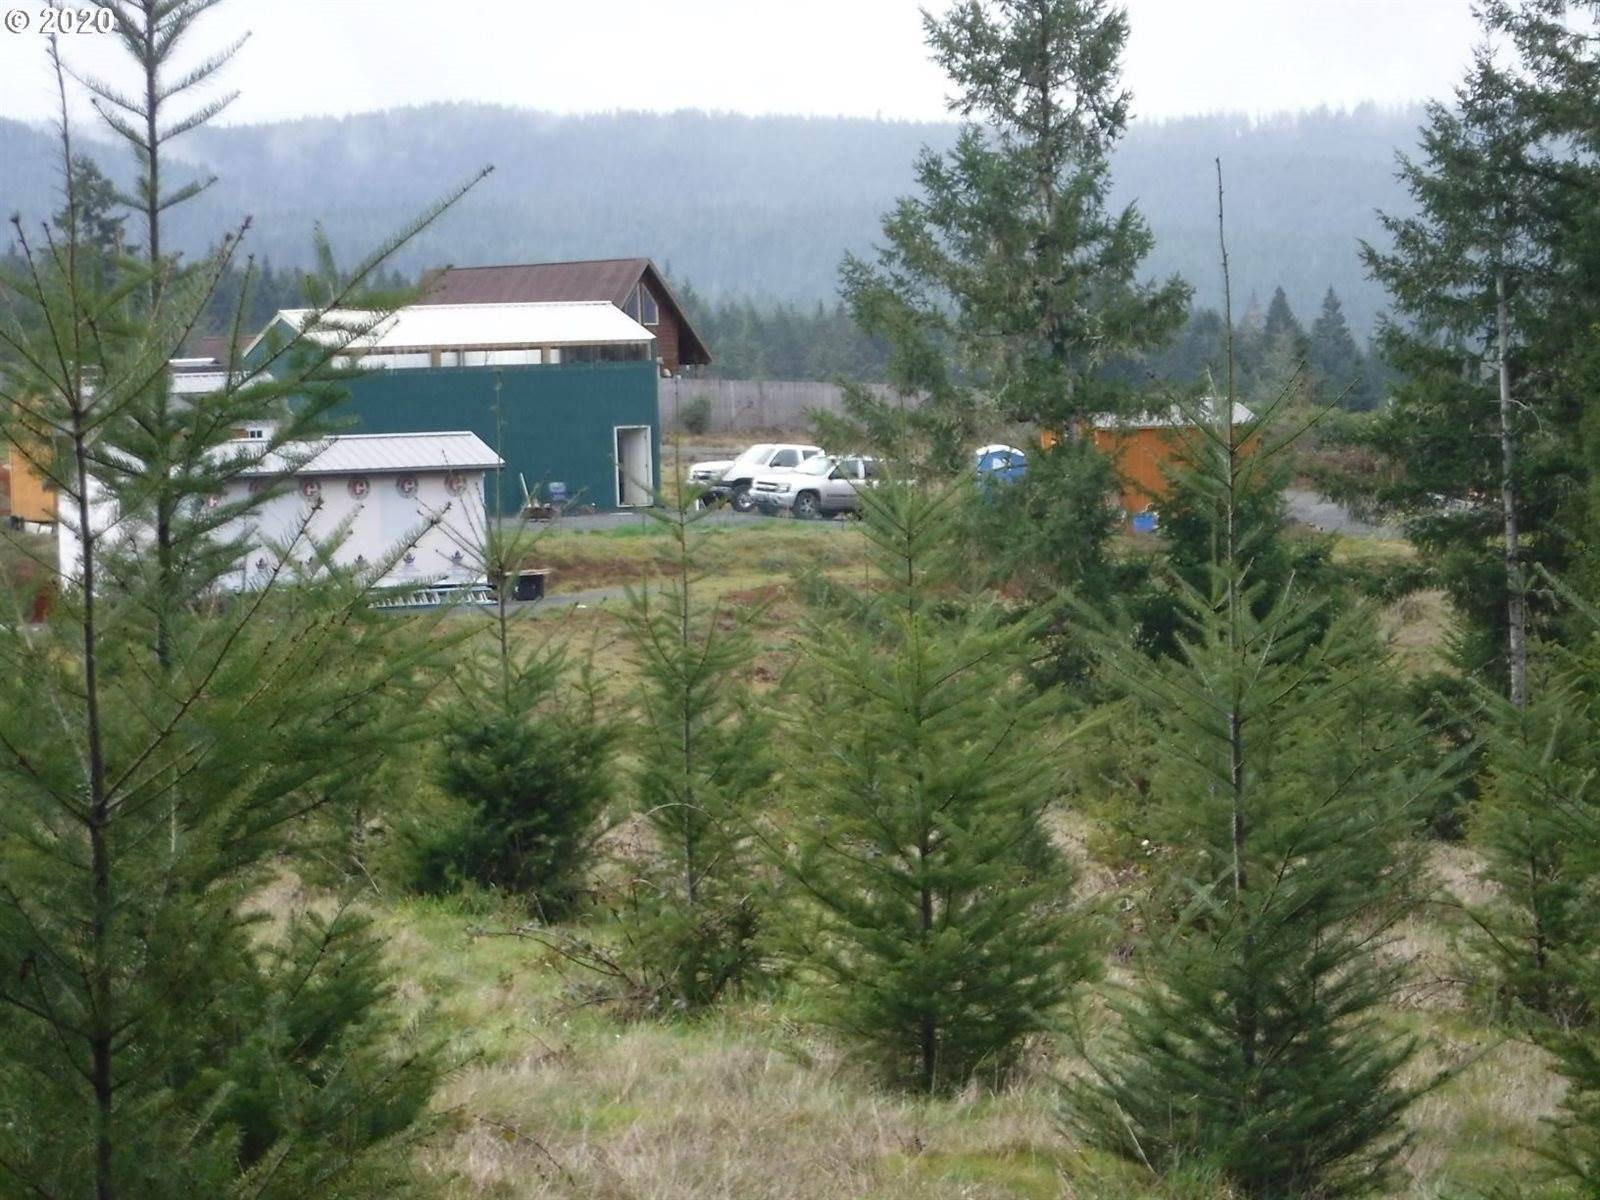 224 Dorthea Dr, Camas Valley, OR 97416